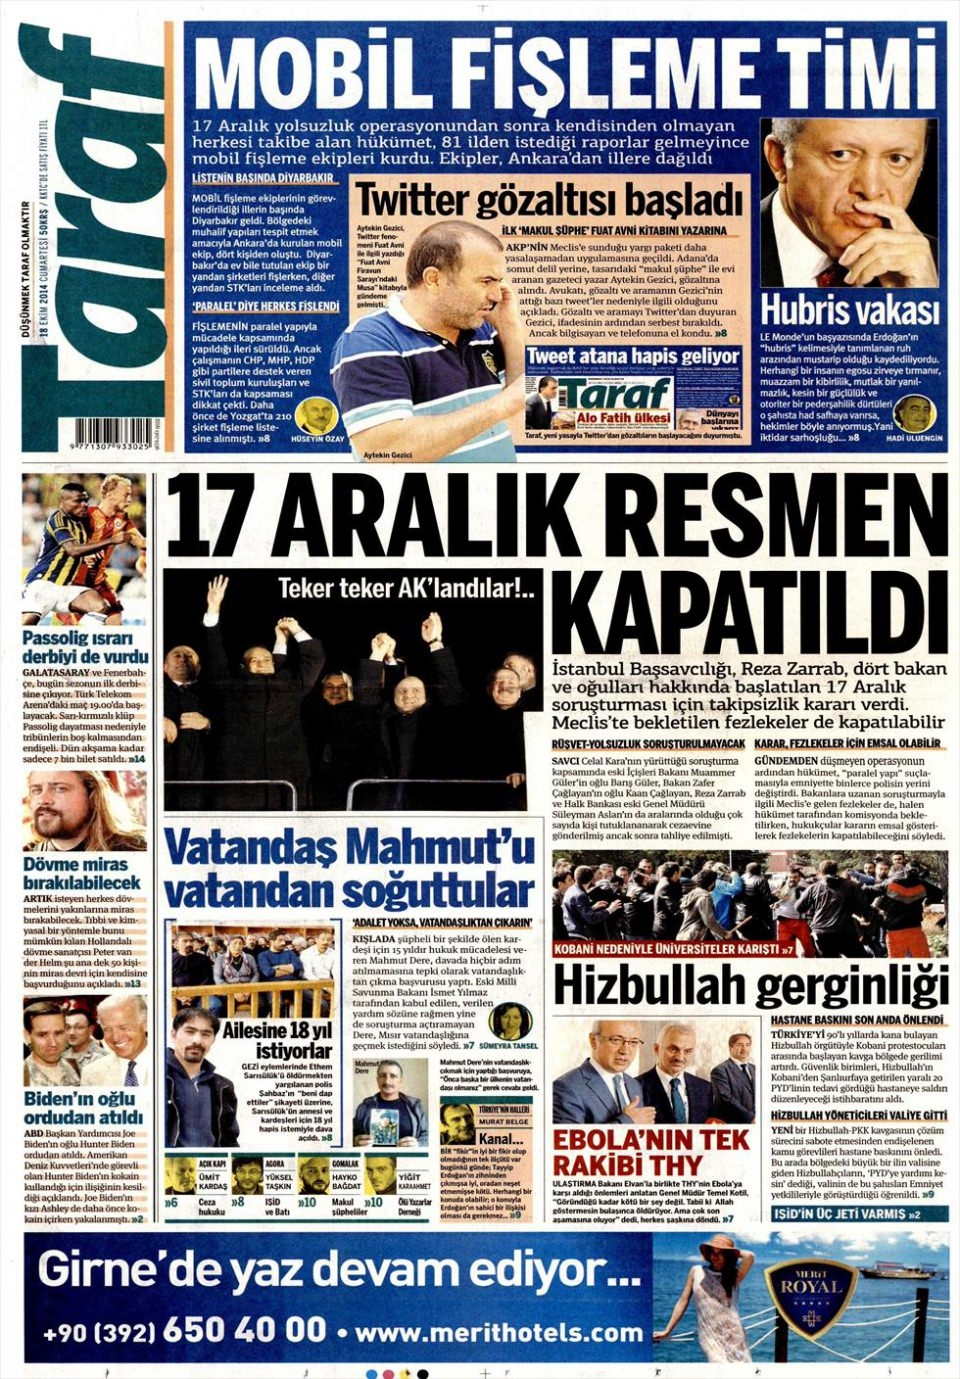 18 Ekim 2014 gazete manşetleri 19